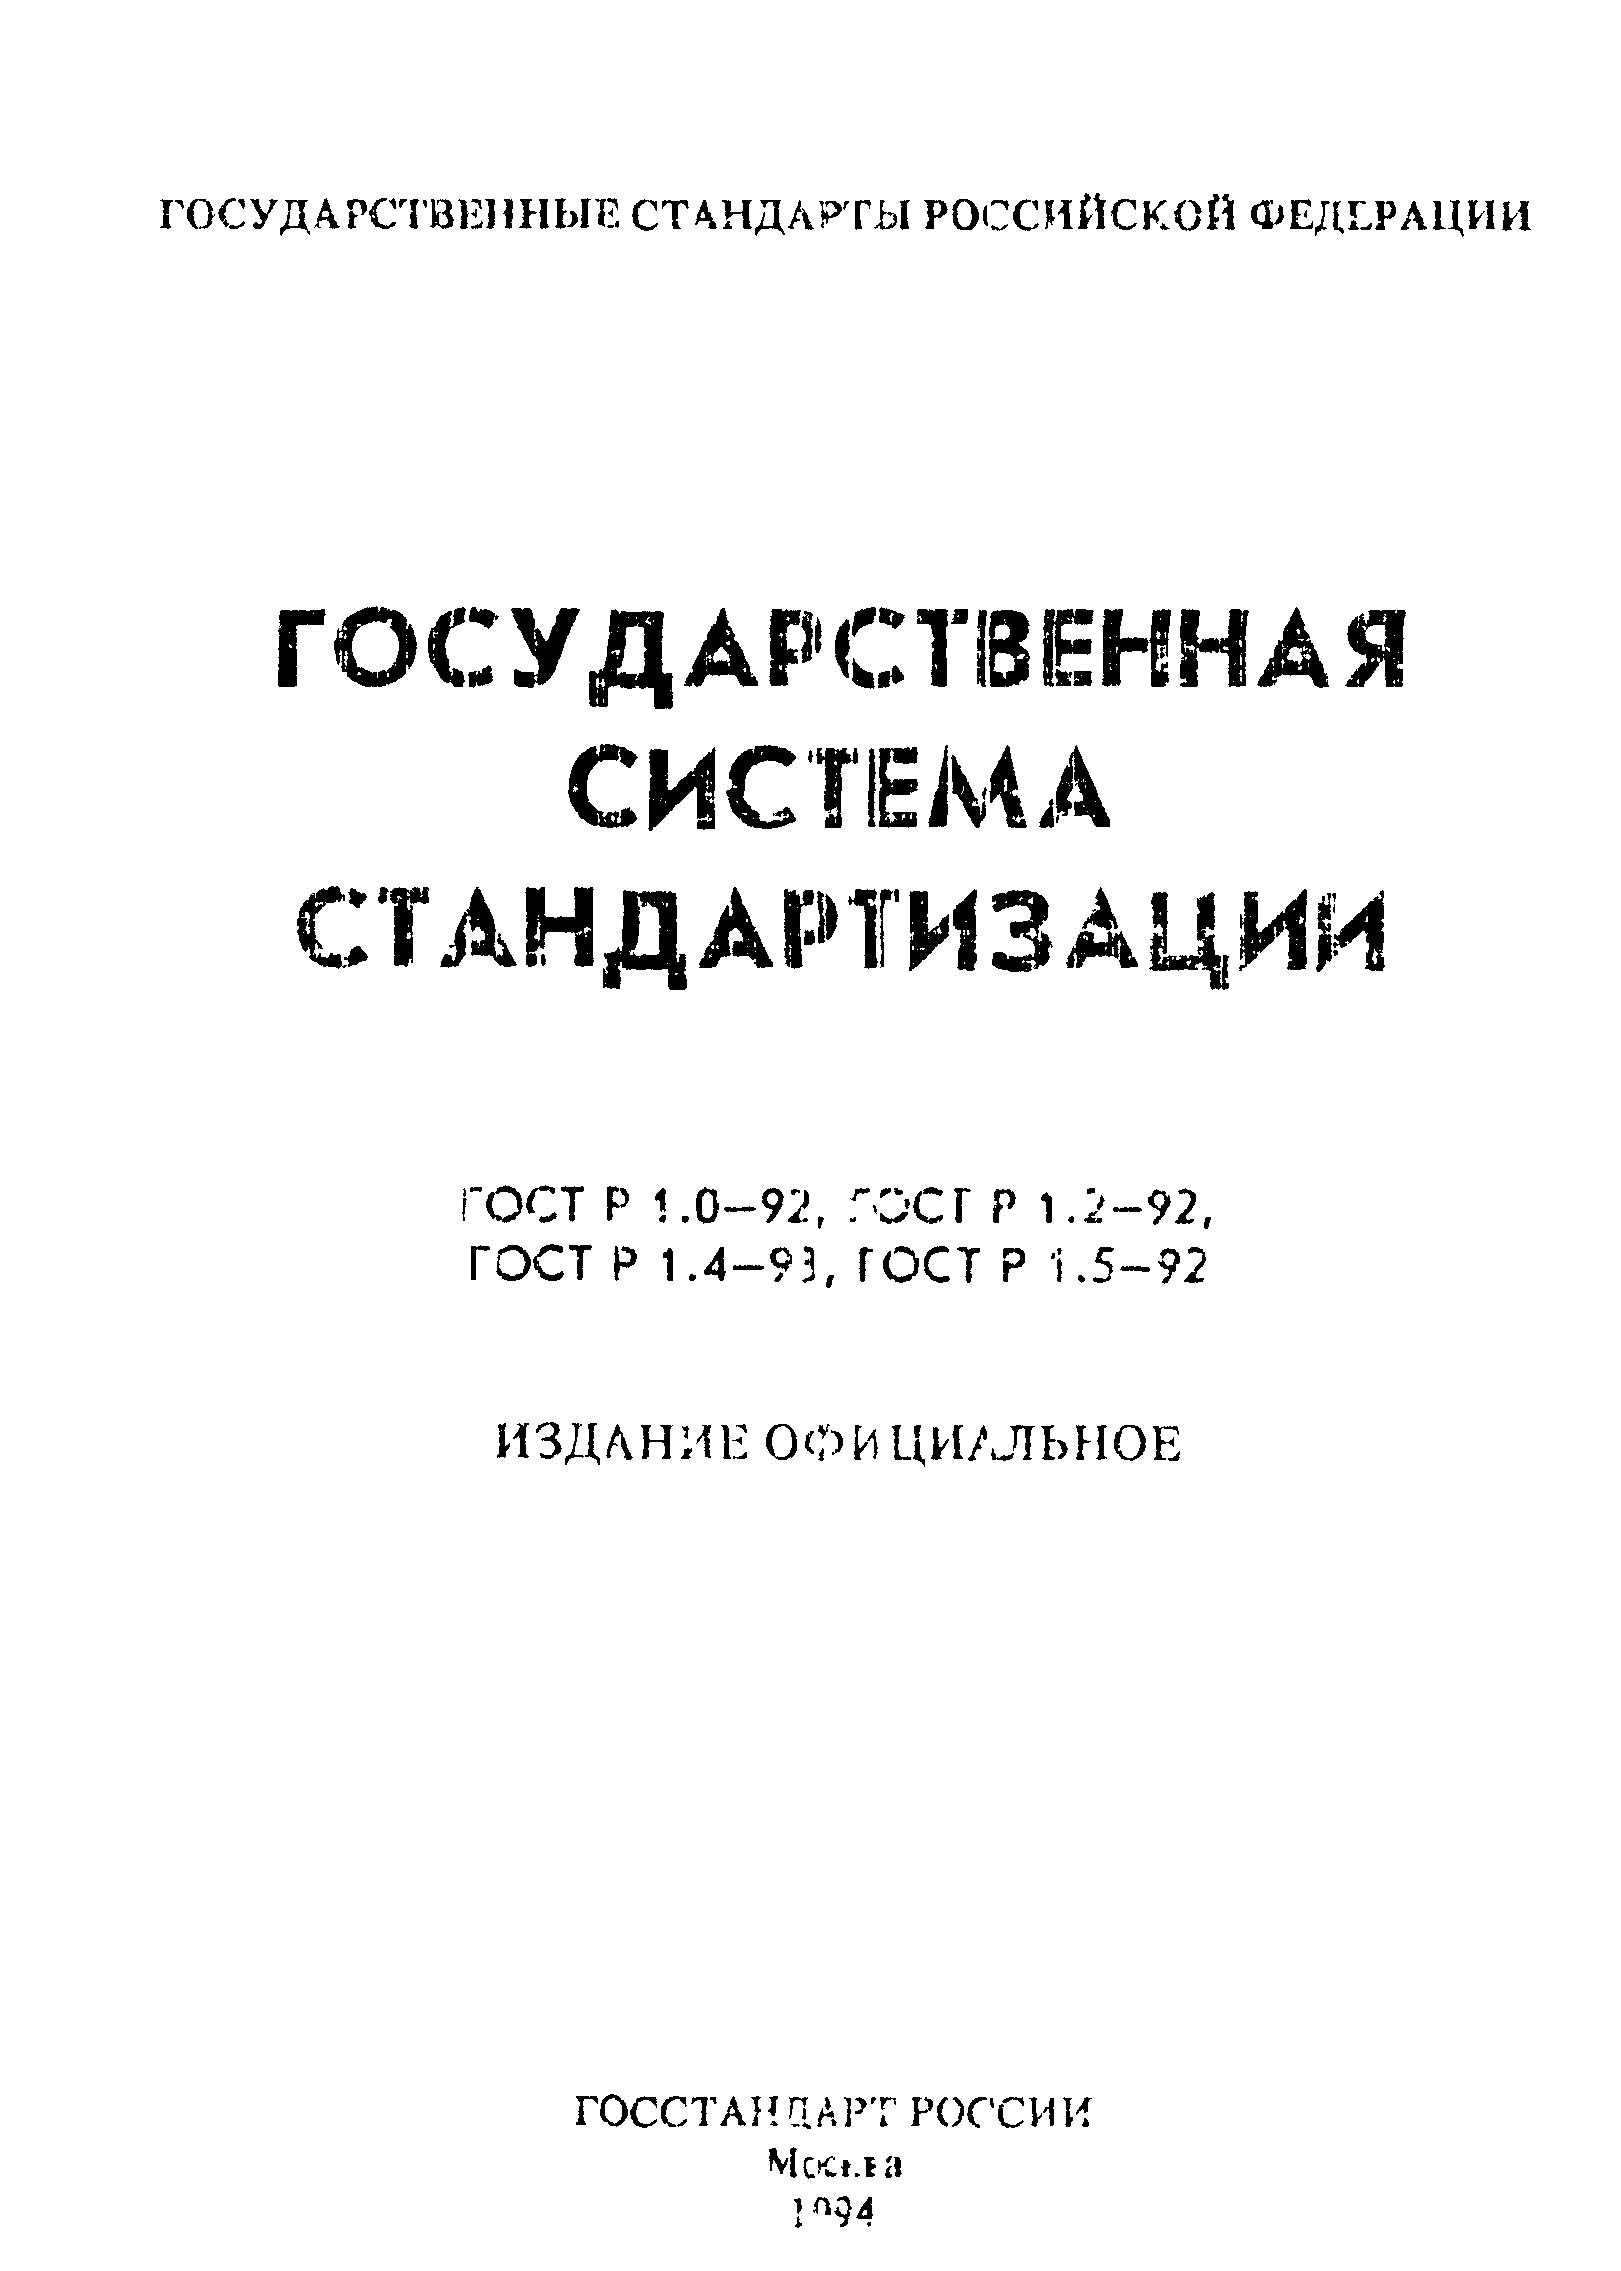 Гост 1.0.92